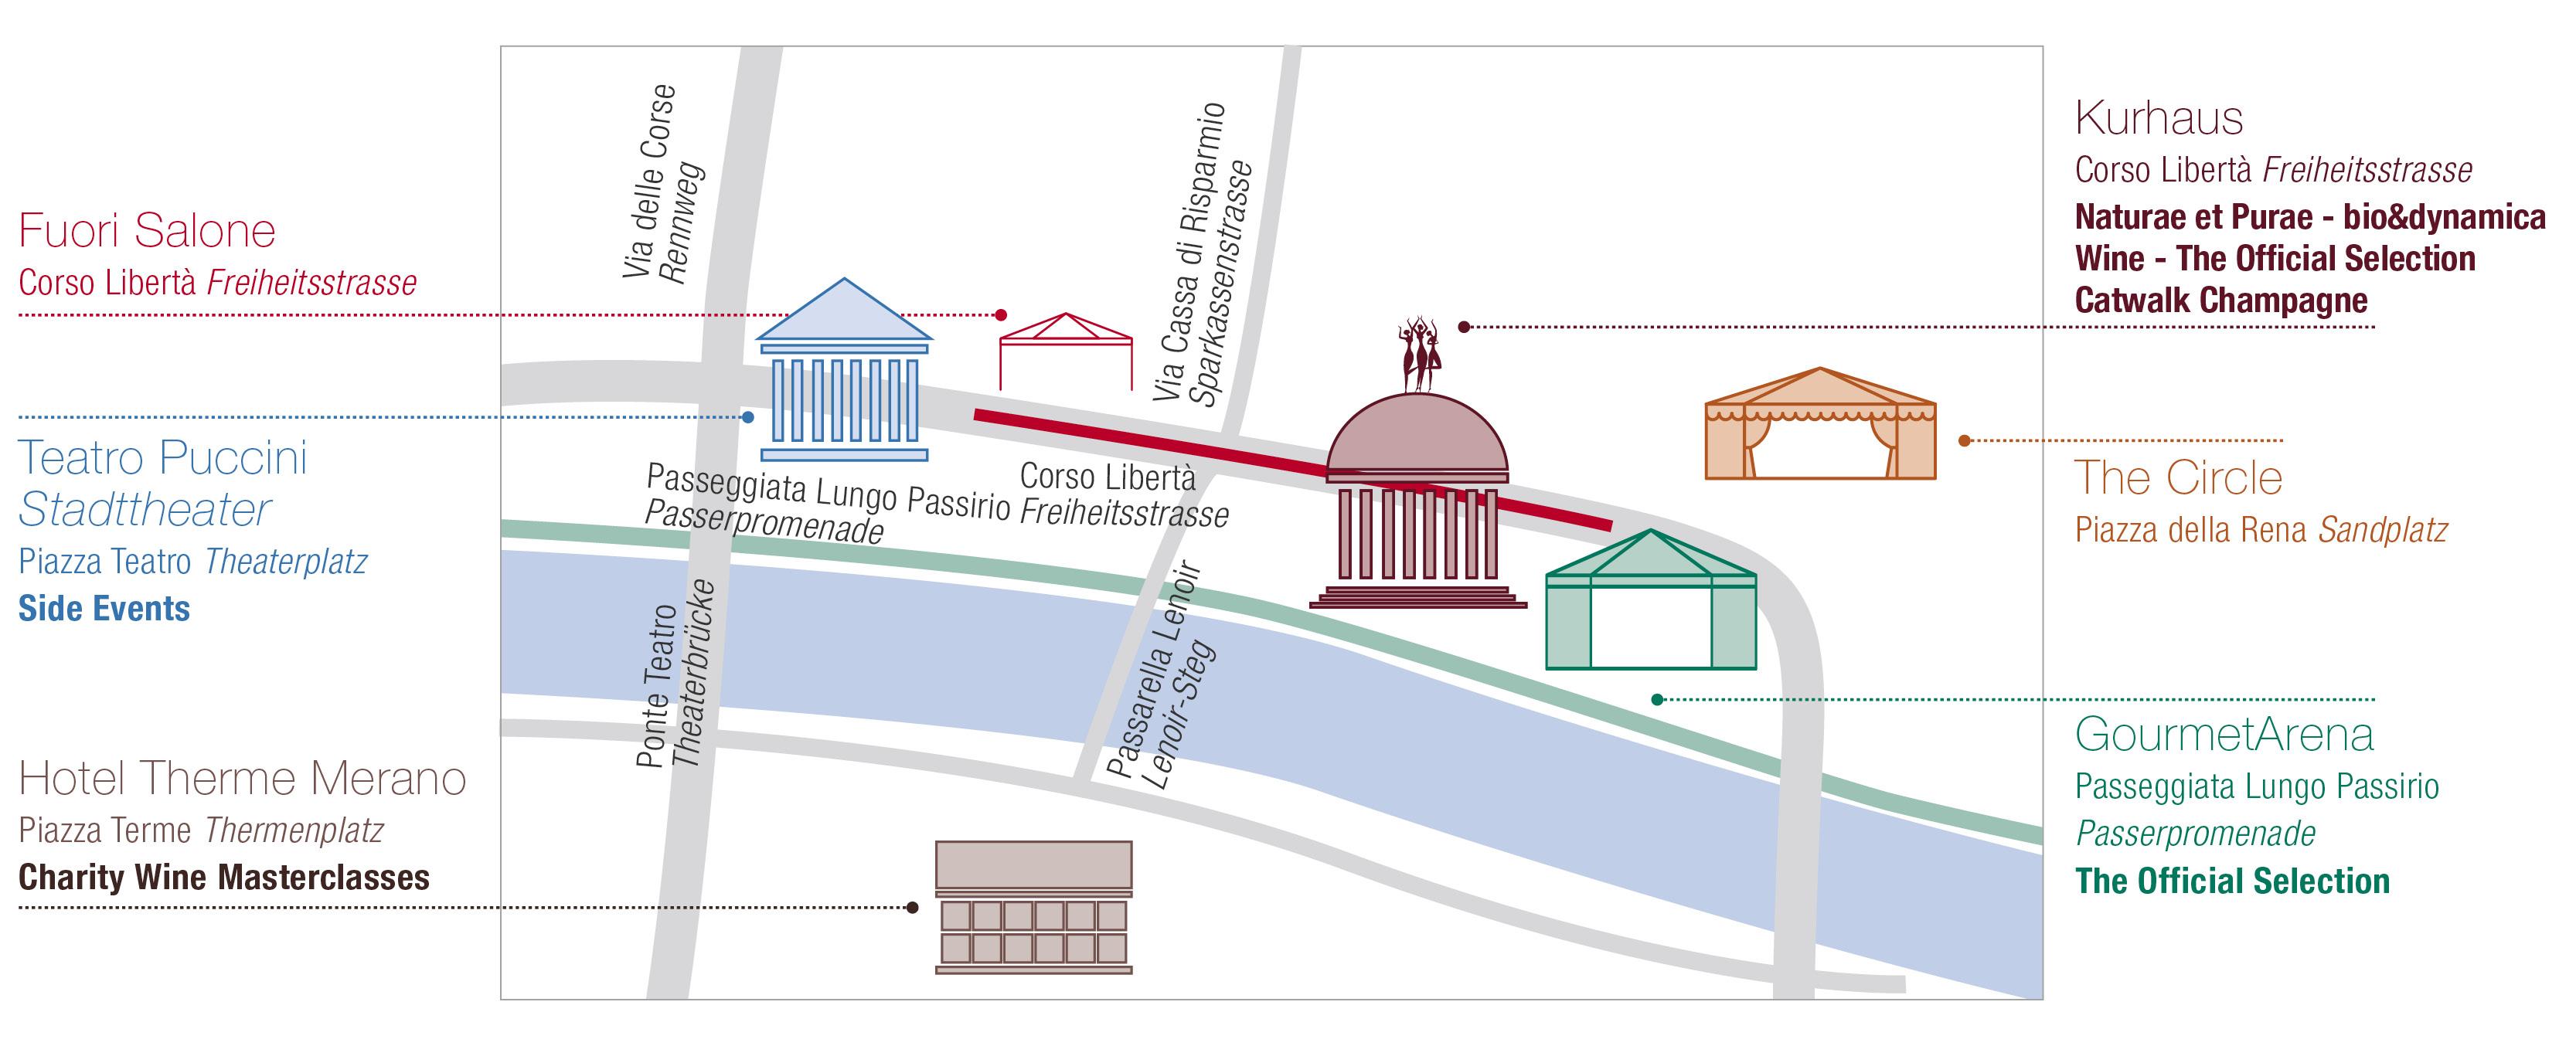 planimetria del merano winefestival